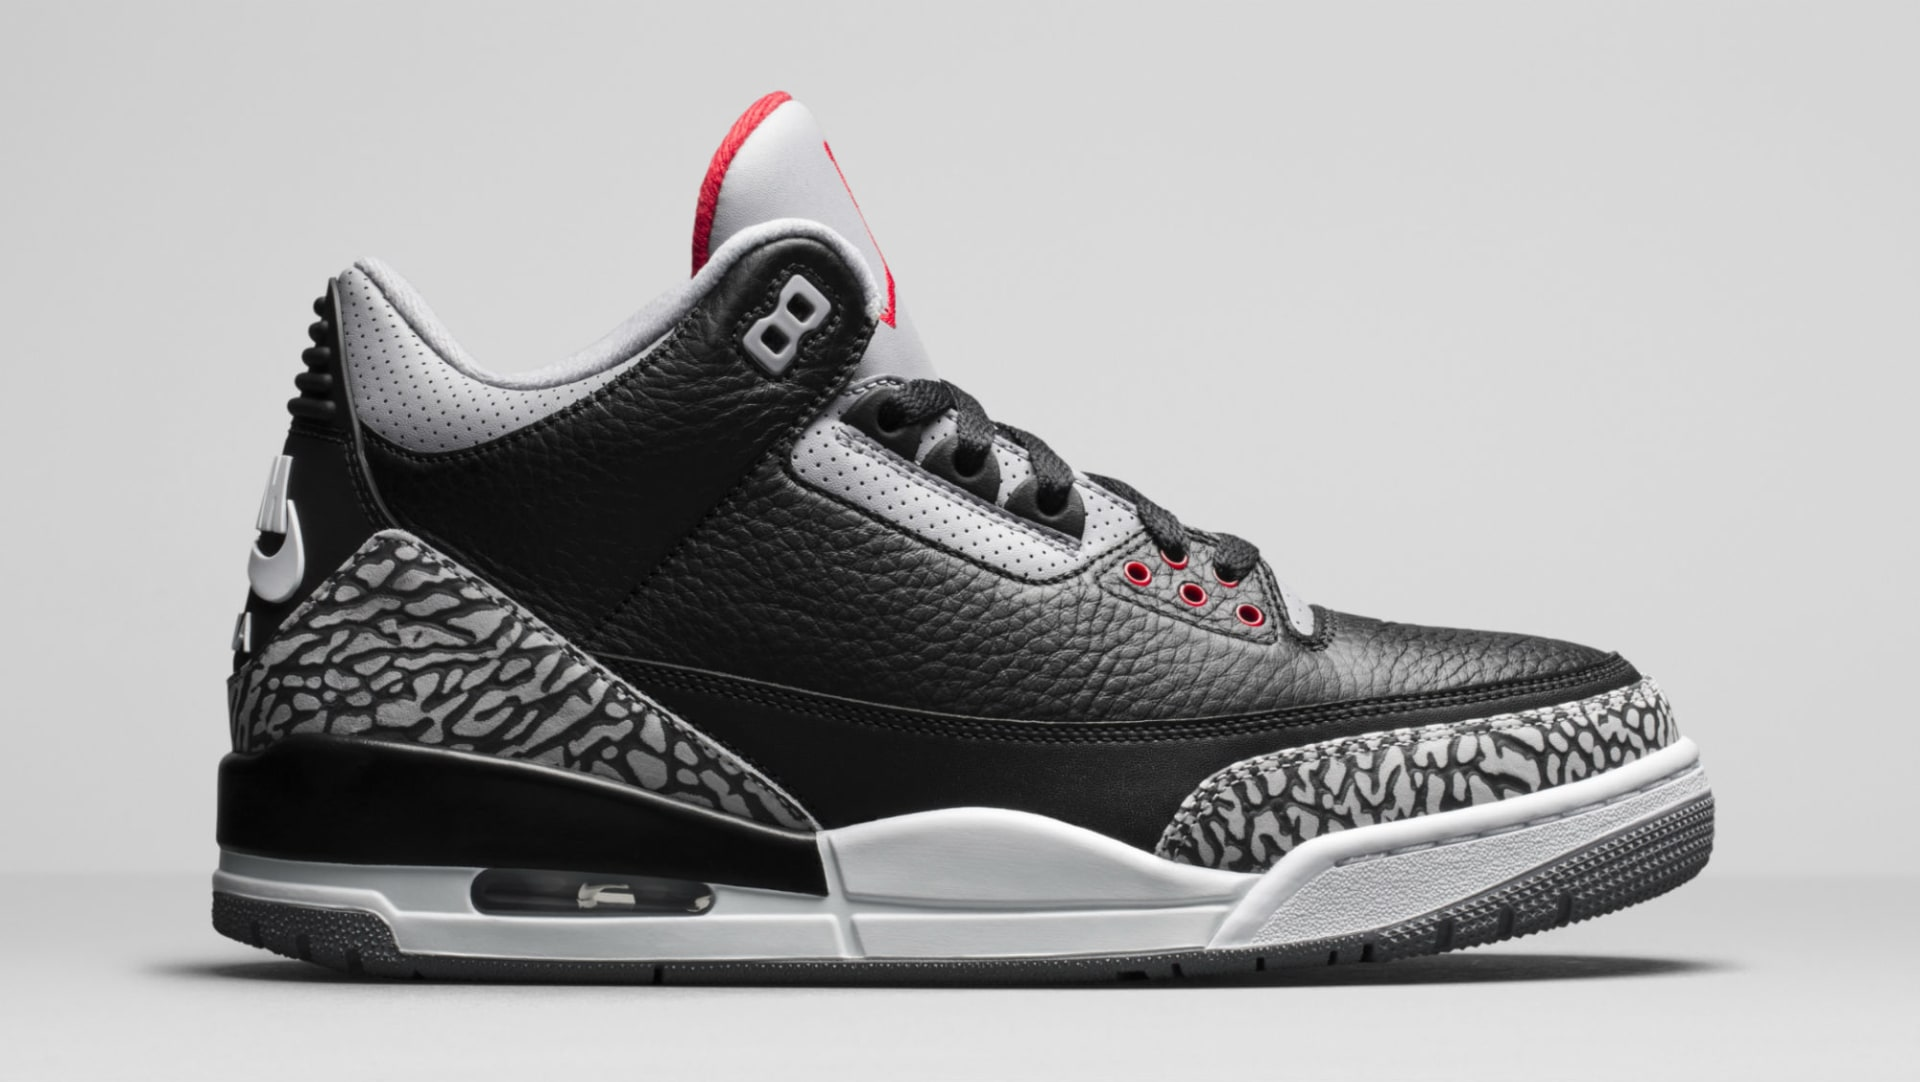 504822dc7df01a Air Jordan 3 III Black Cement Release Date 854262-001